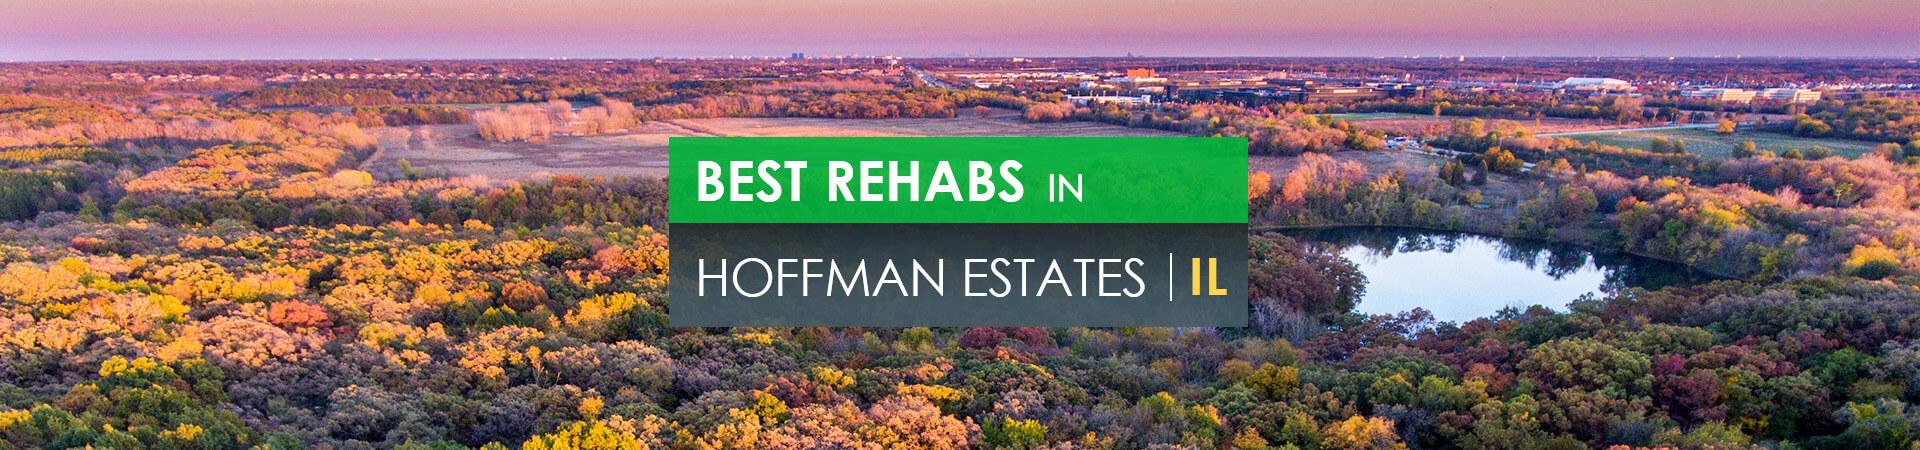 Best rehabs in Hoffman Estates, IL